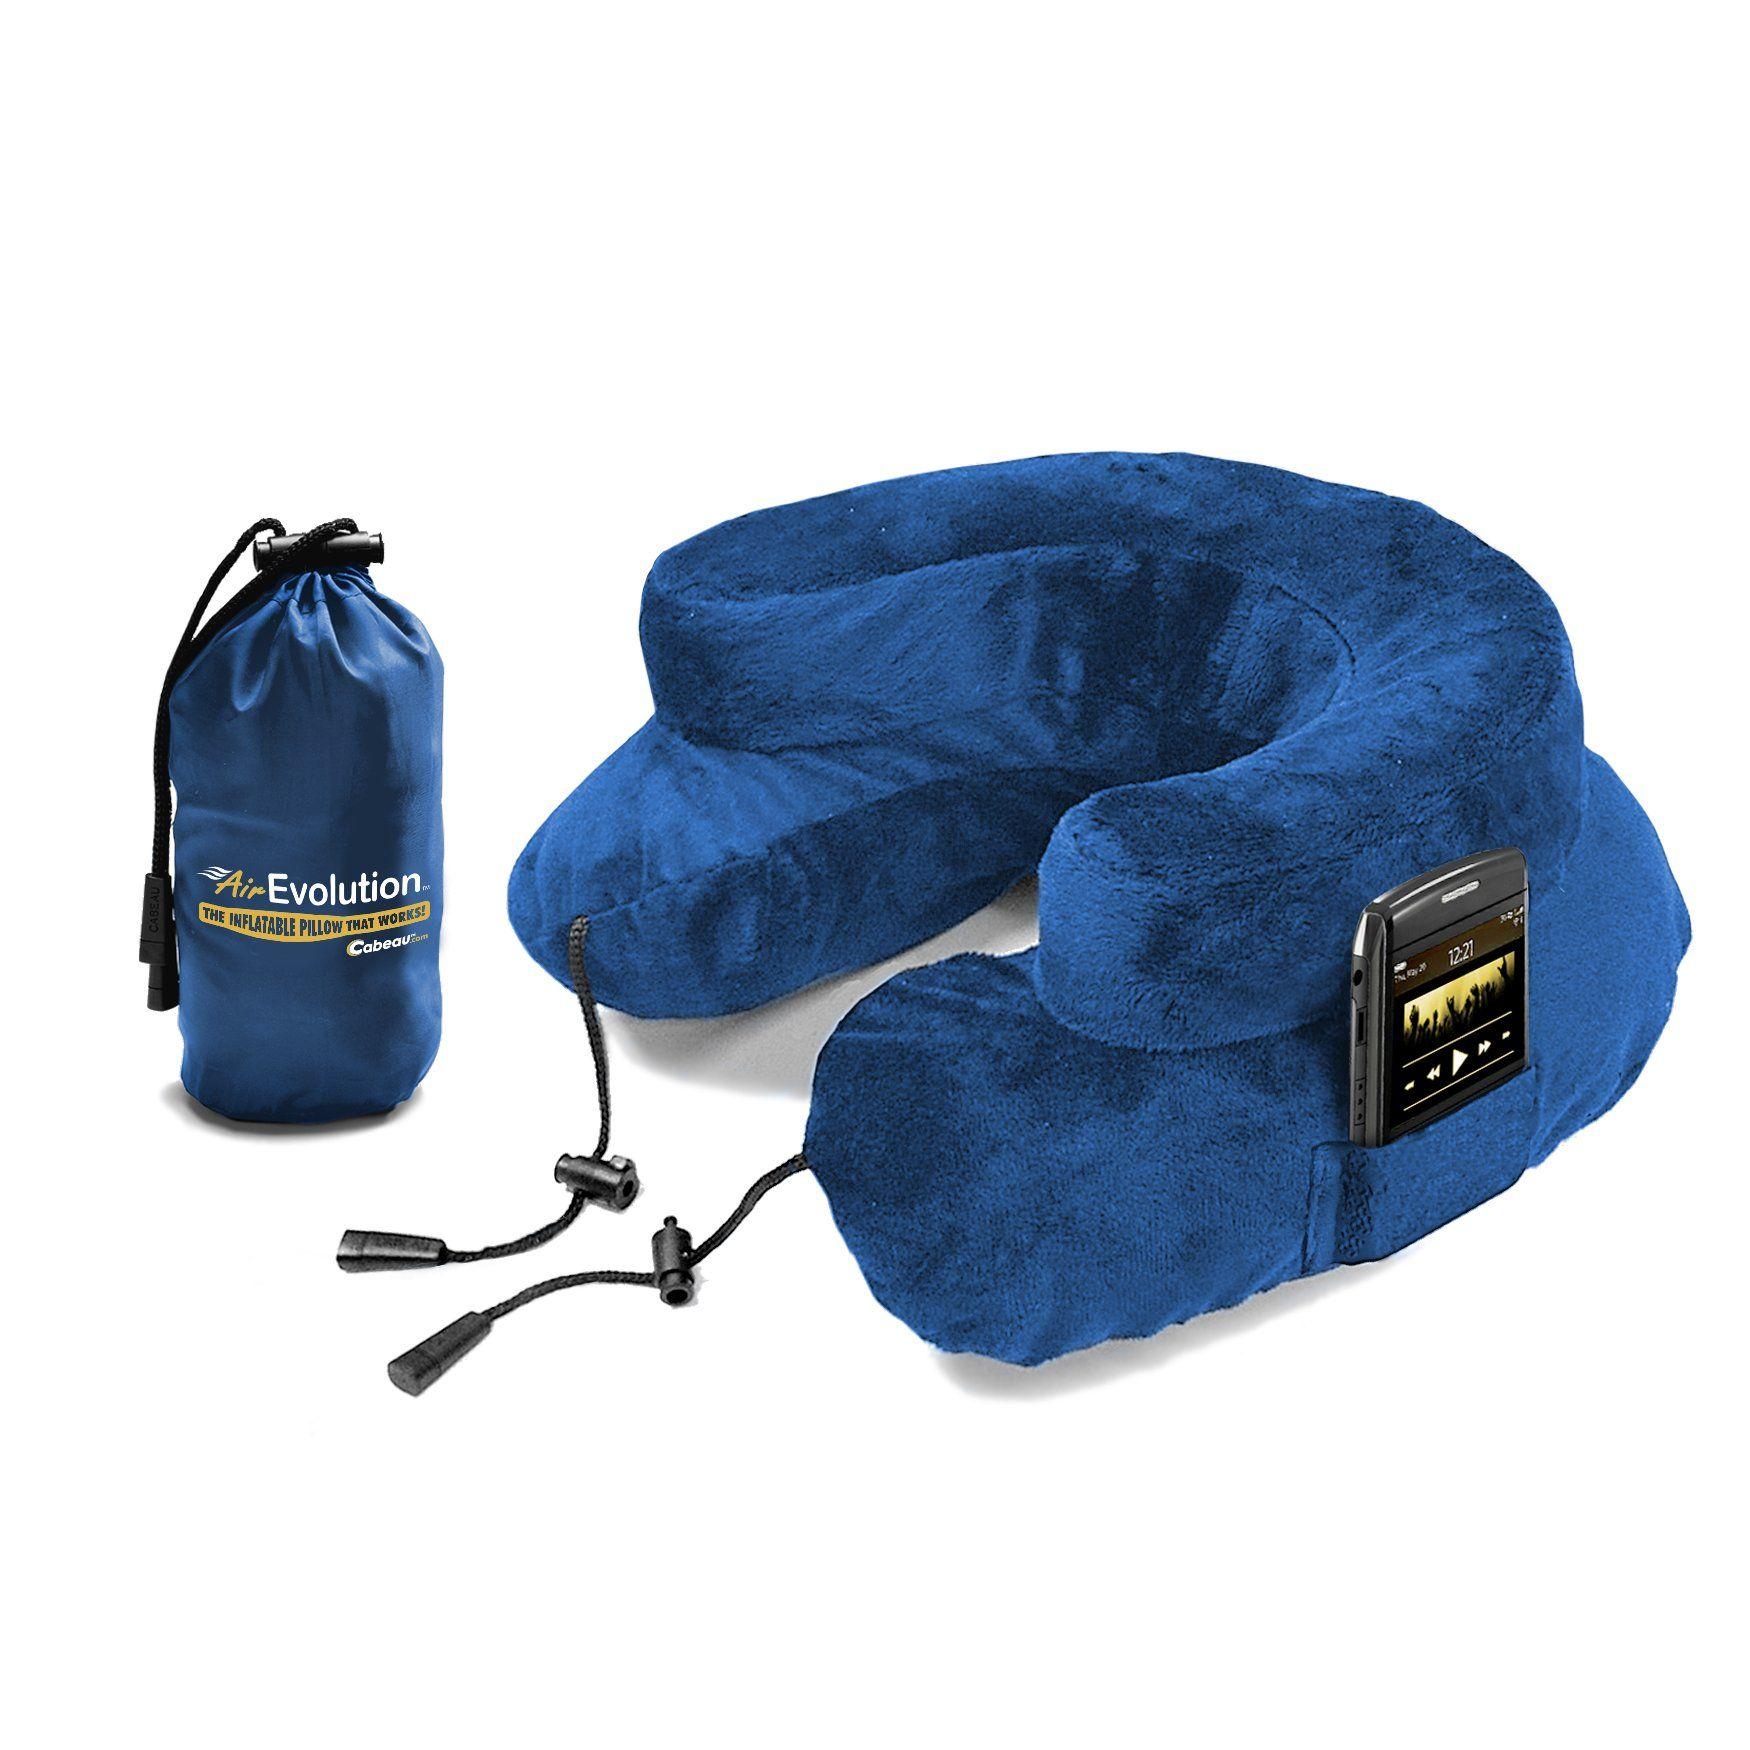 "CABEAU ""Air Evolution"" Inflatable Neck Pillow + Small Bag"